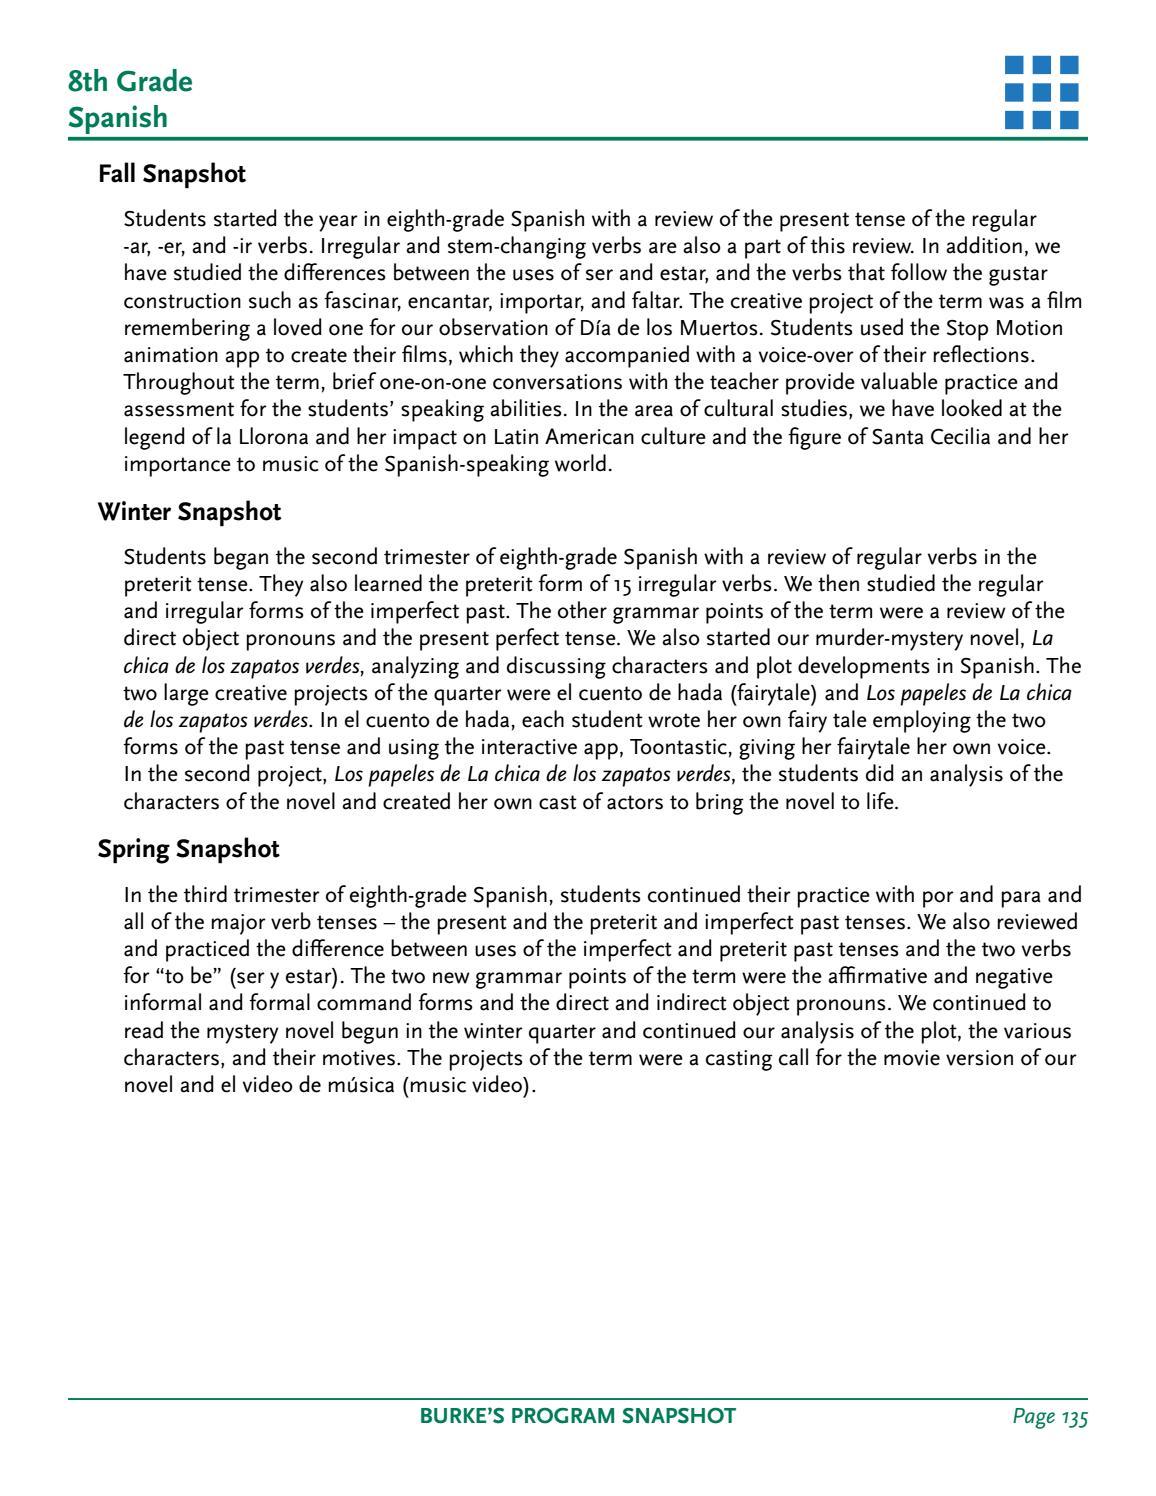 Burke's Program Snapshots 2016-2017 by Burke's School - issuu